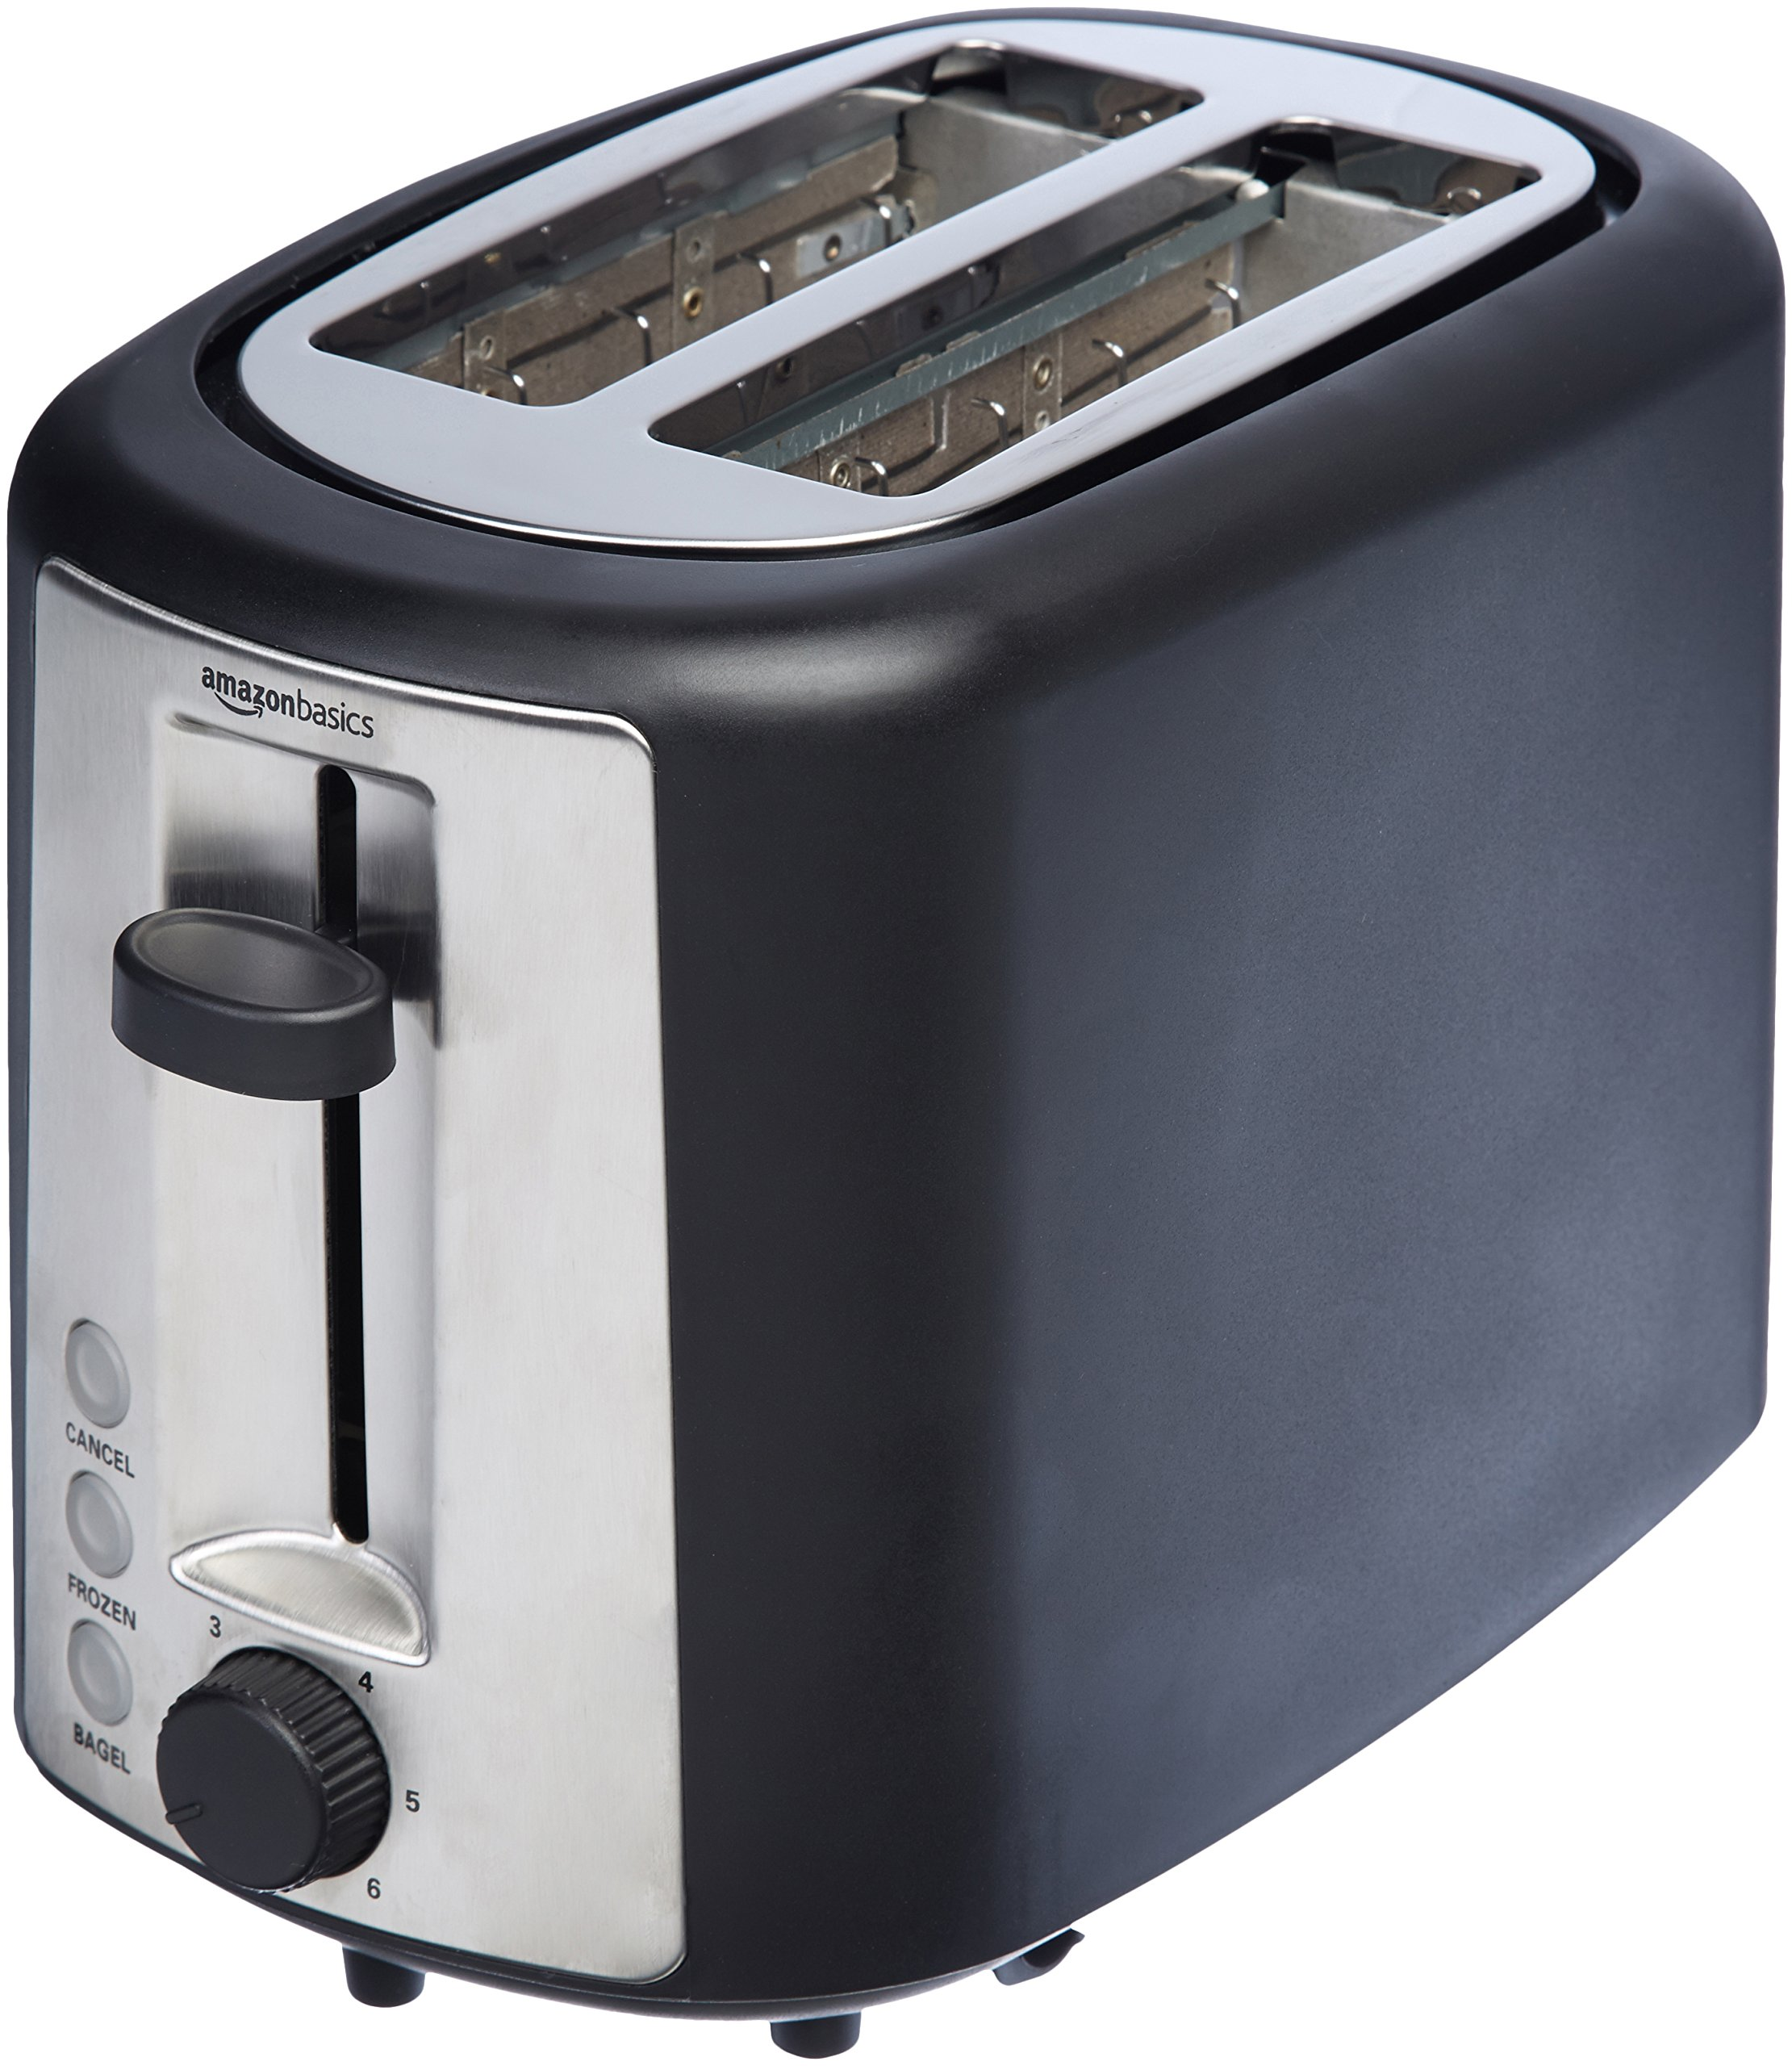 AmazonBasics KT-3680 2-Slice Toaster